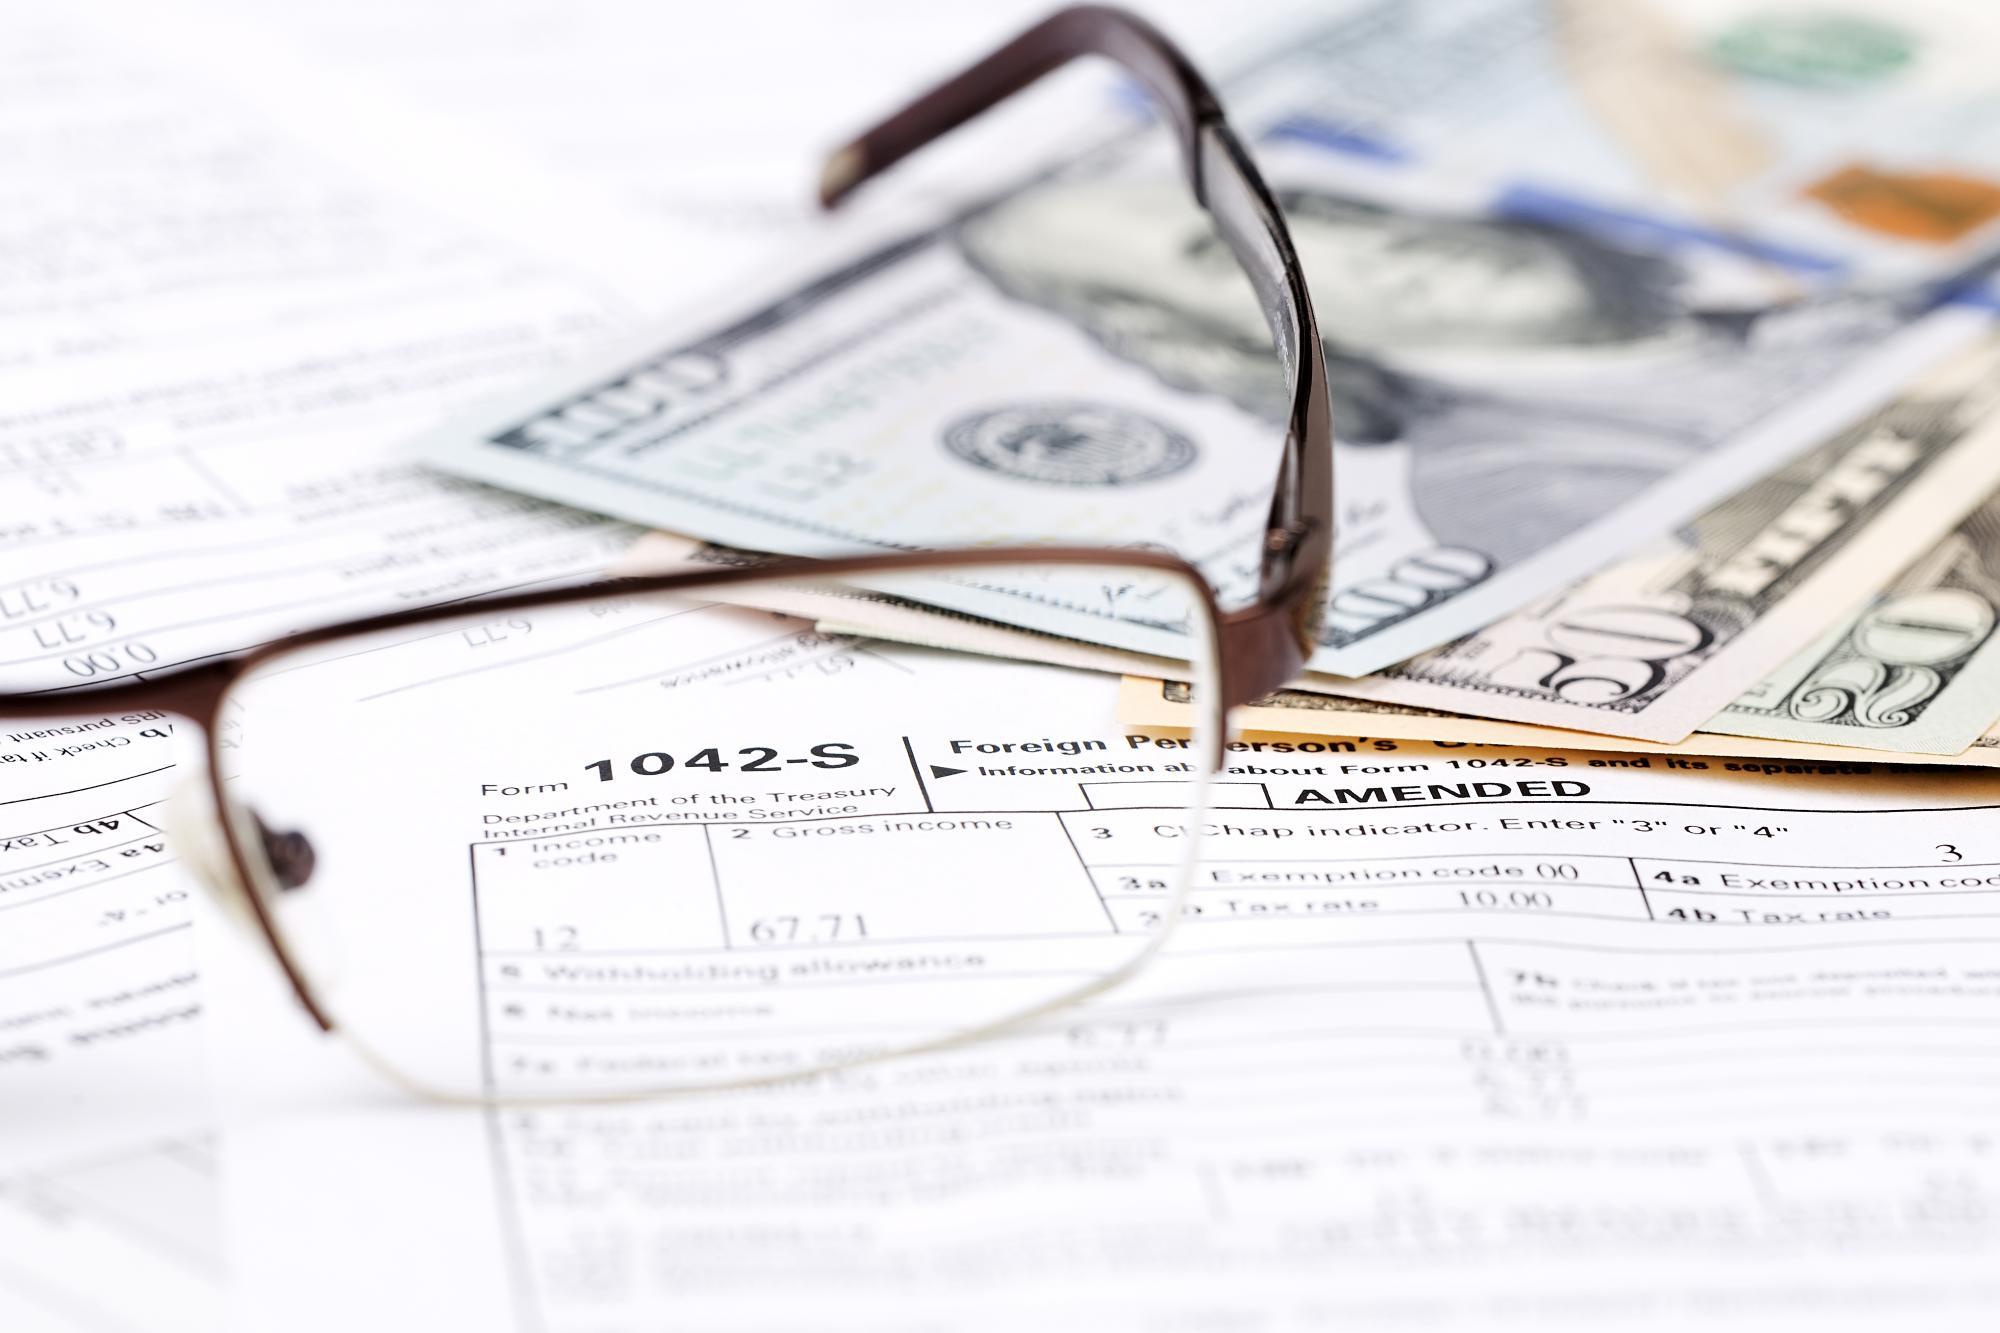 Госдума приняла закон о приказном производстве при взыскании налогов с физлиц